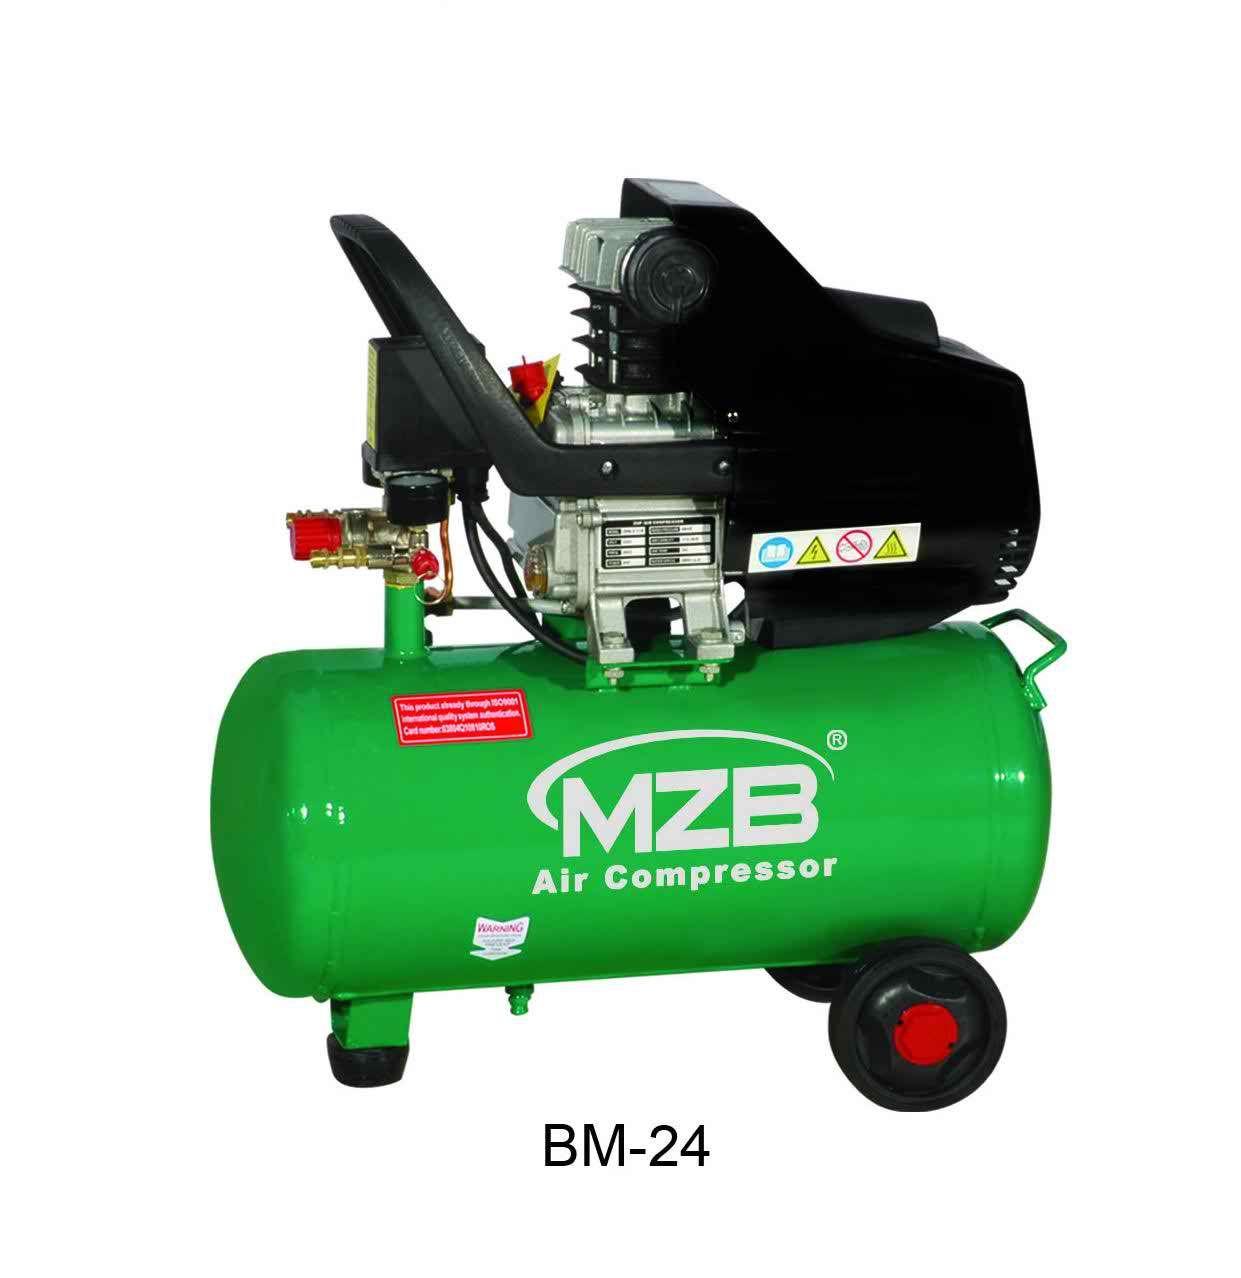 Air Porn One mzb bm-24 air compressor #aircompressor7 wwwpressorguide